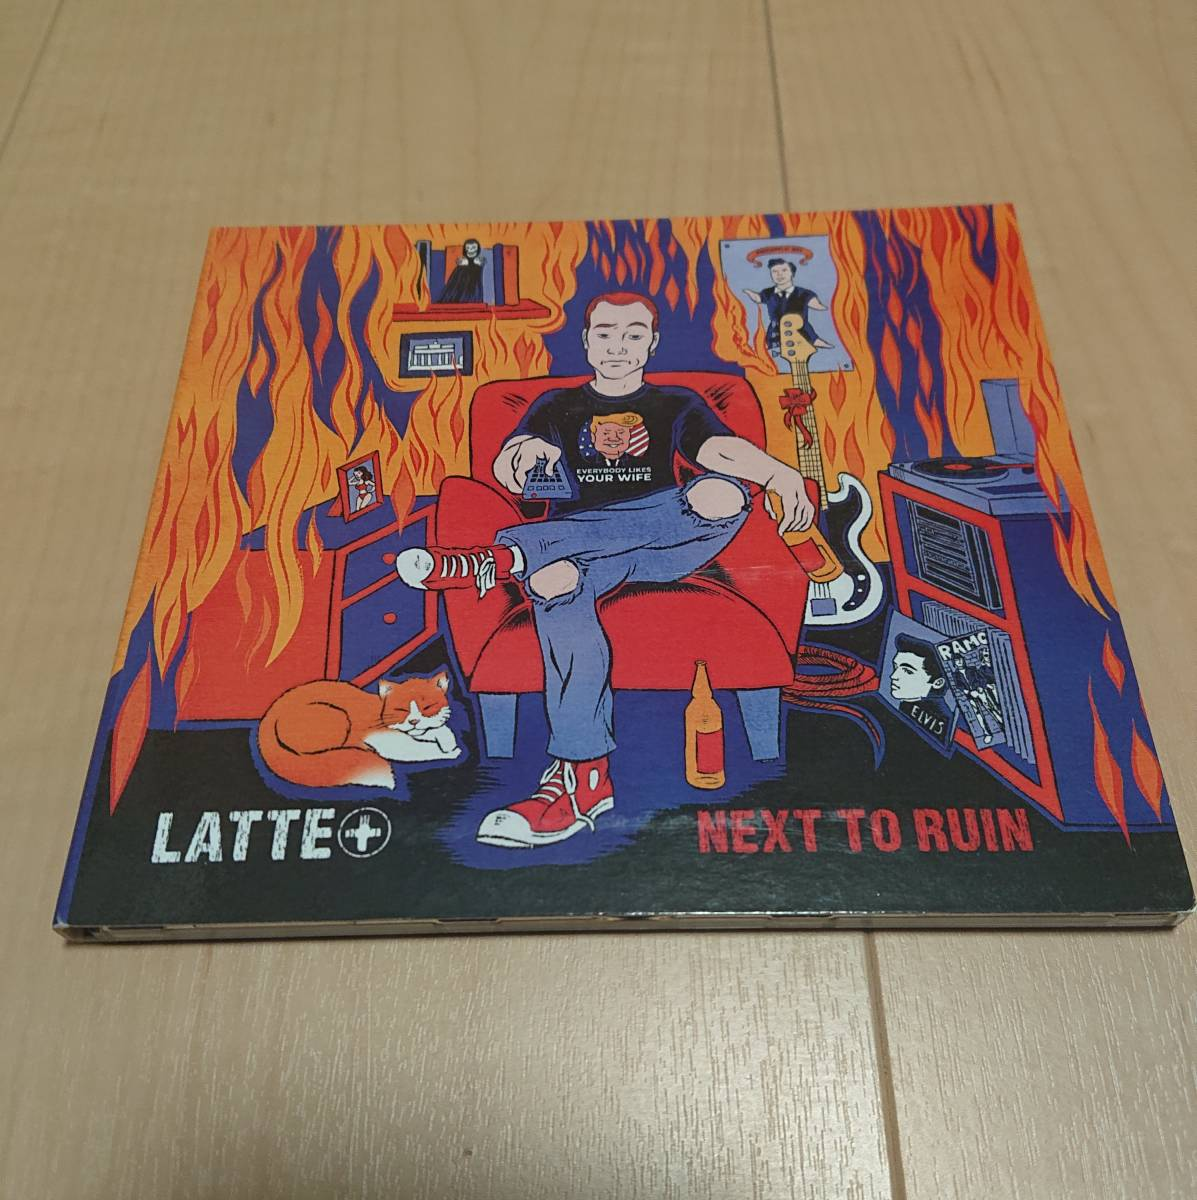 【Latte+ - Next To Ruin】manges queers screeching weasel pop punk